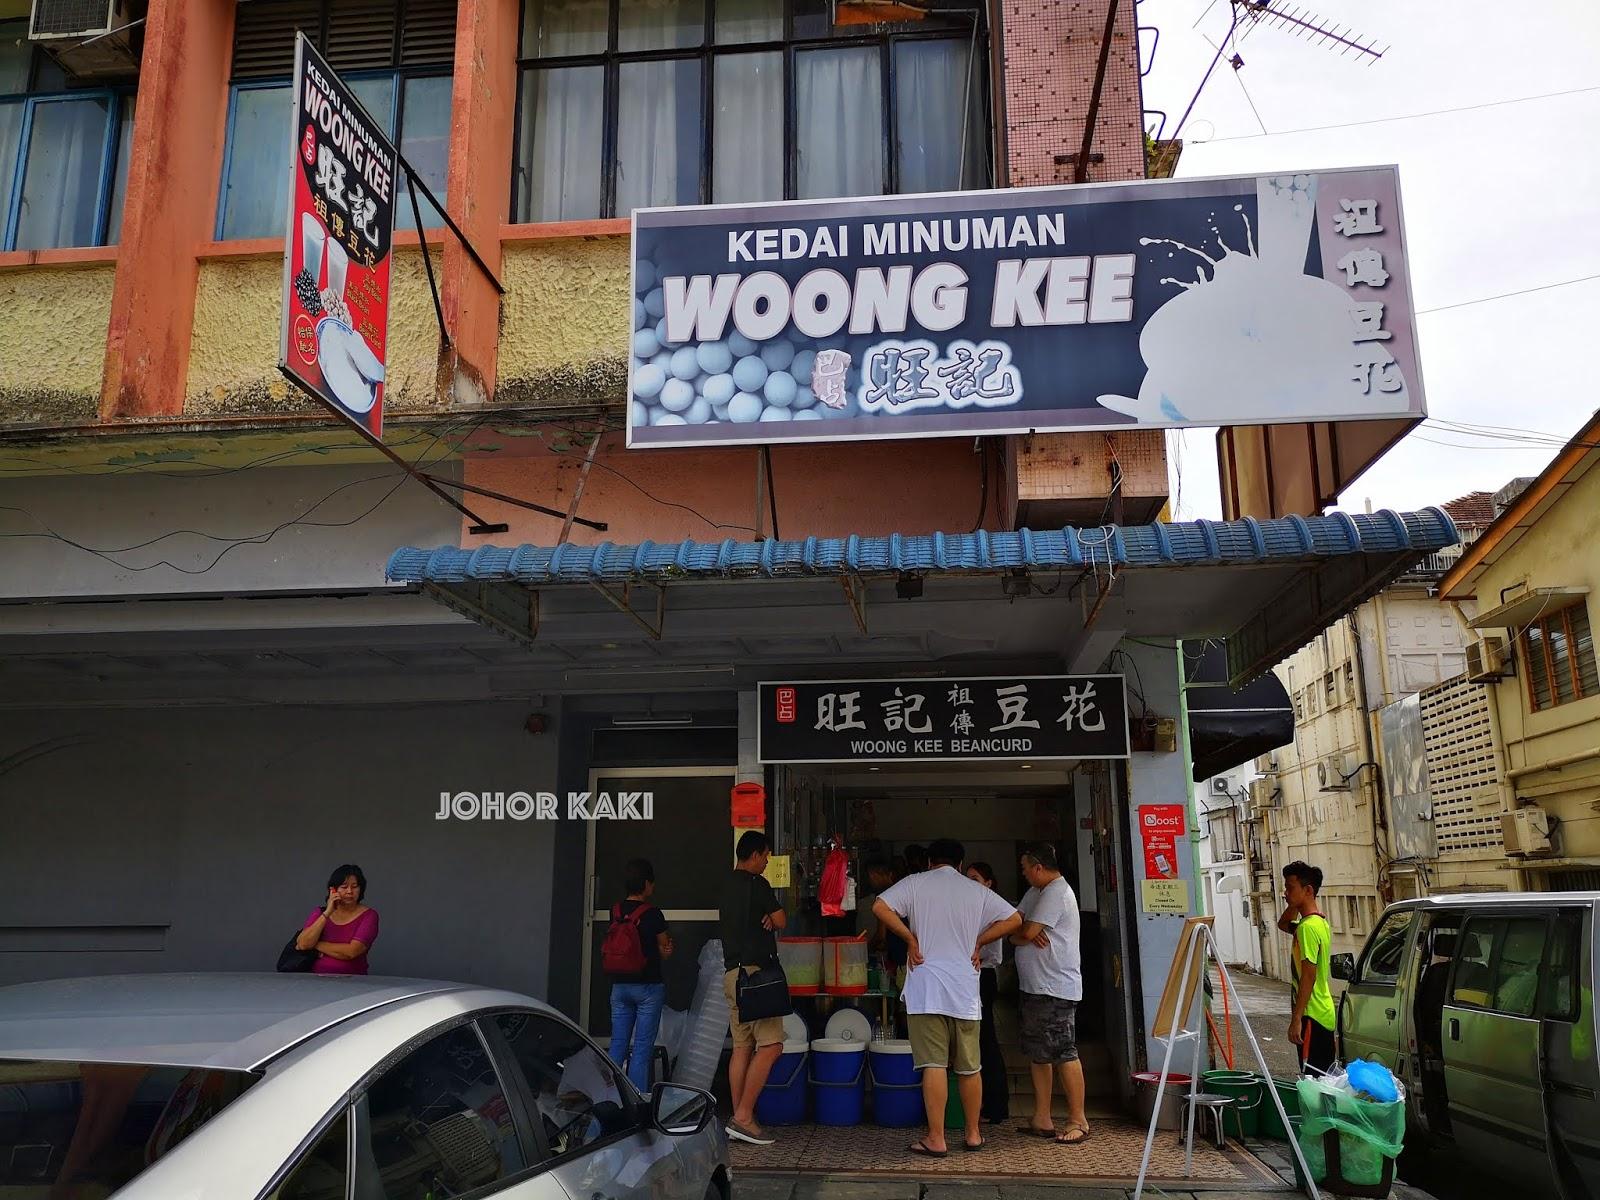 Woong Kee Tau Fu Fah 1